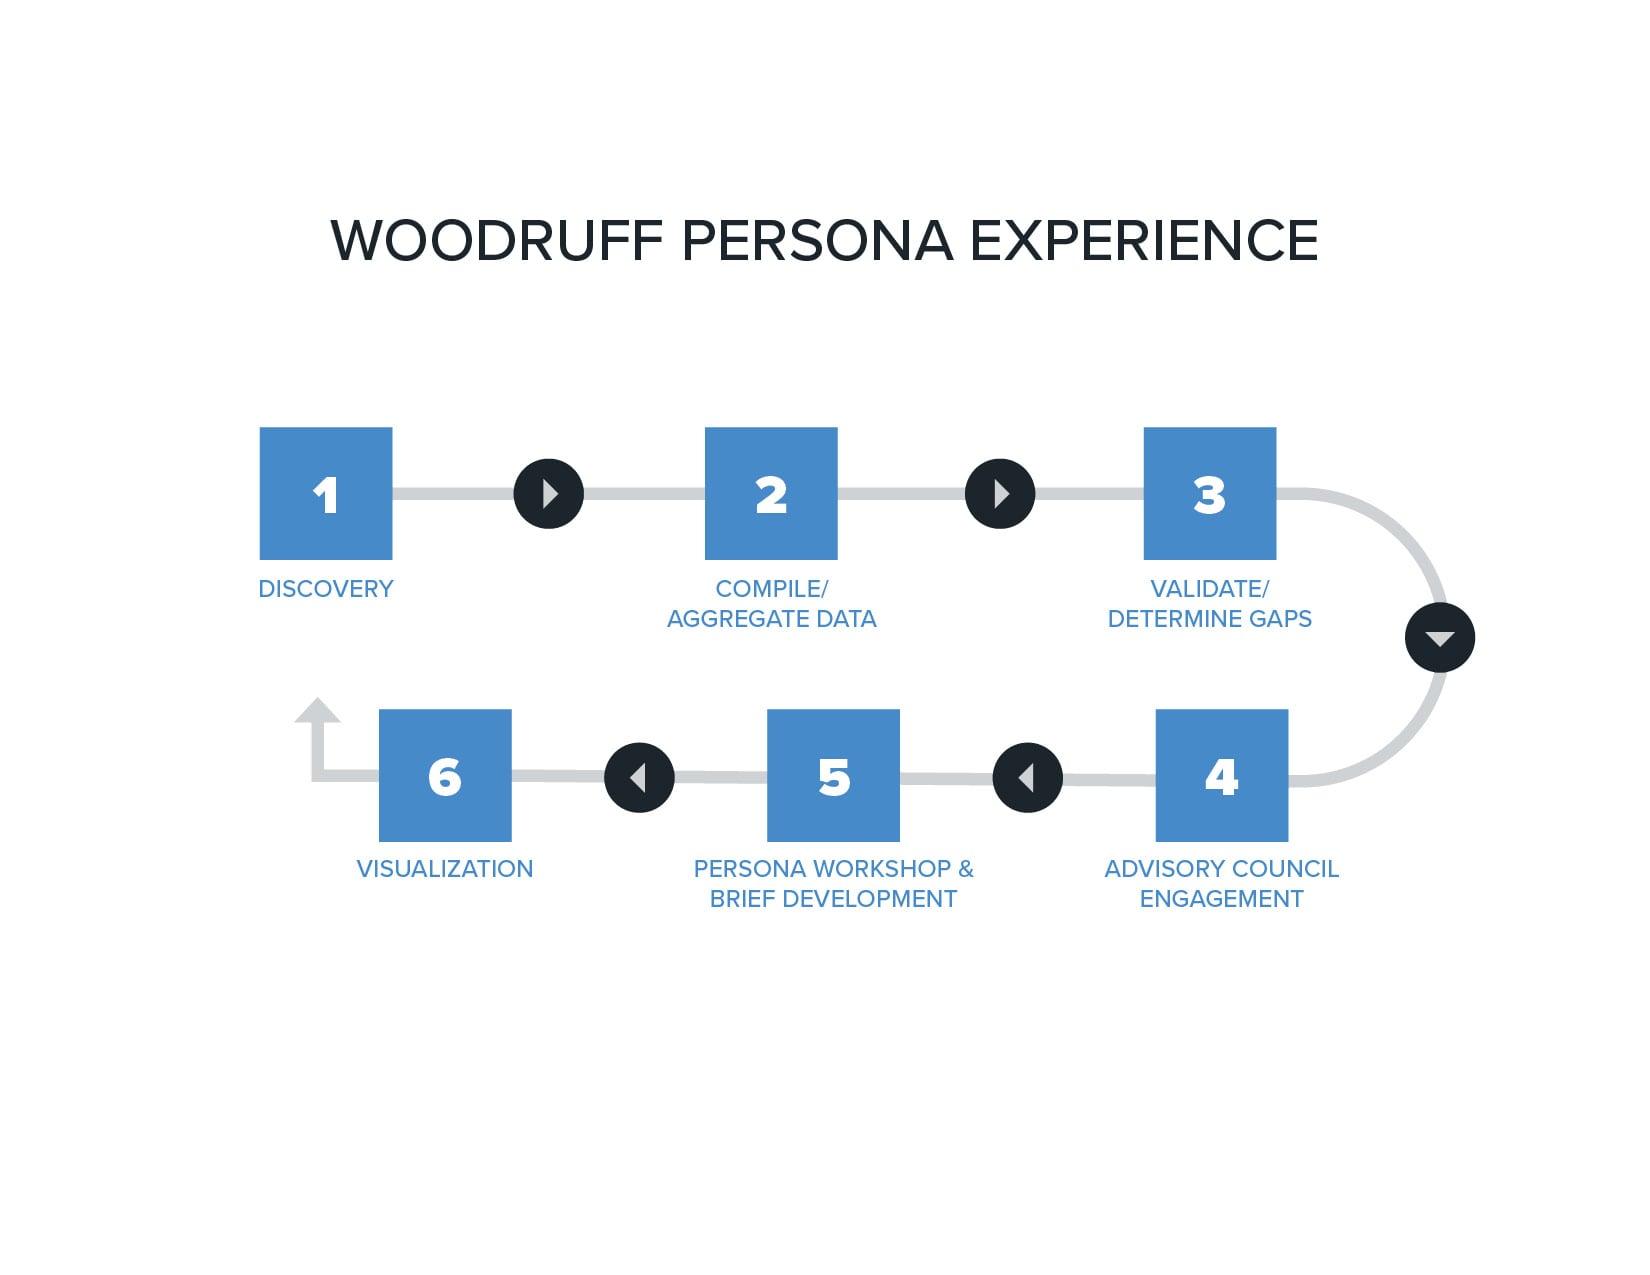 Woodruff Persona Experience Workflow Chart | Woodruff